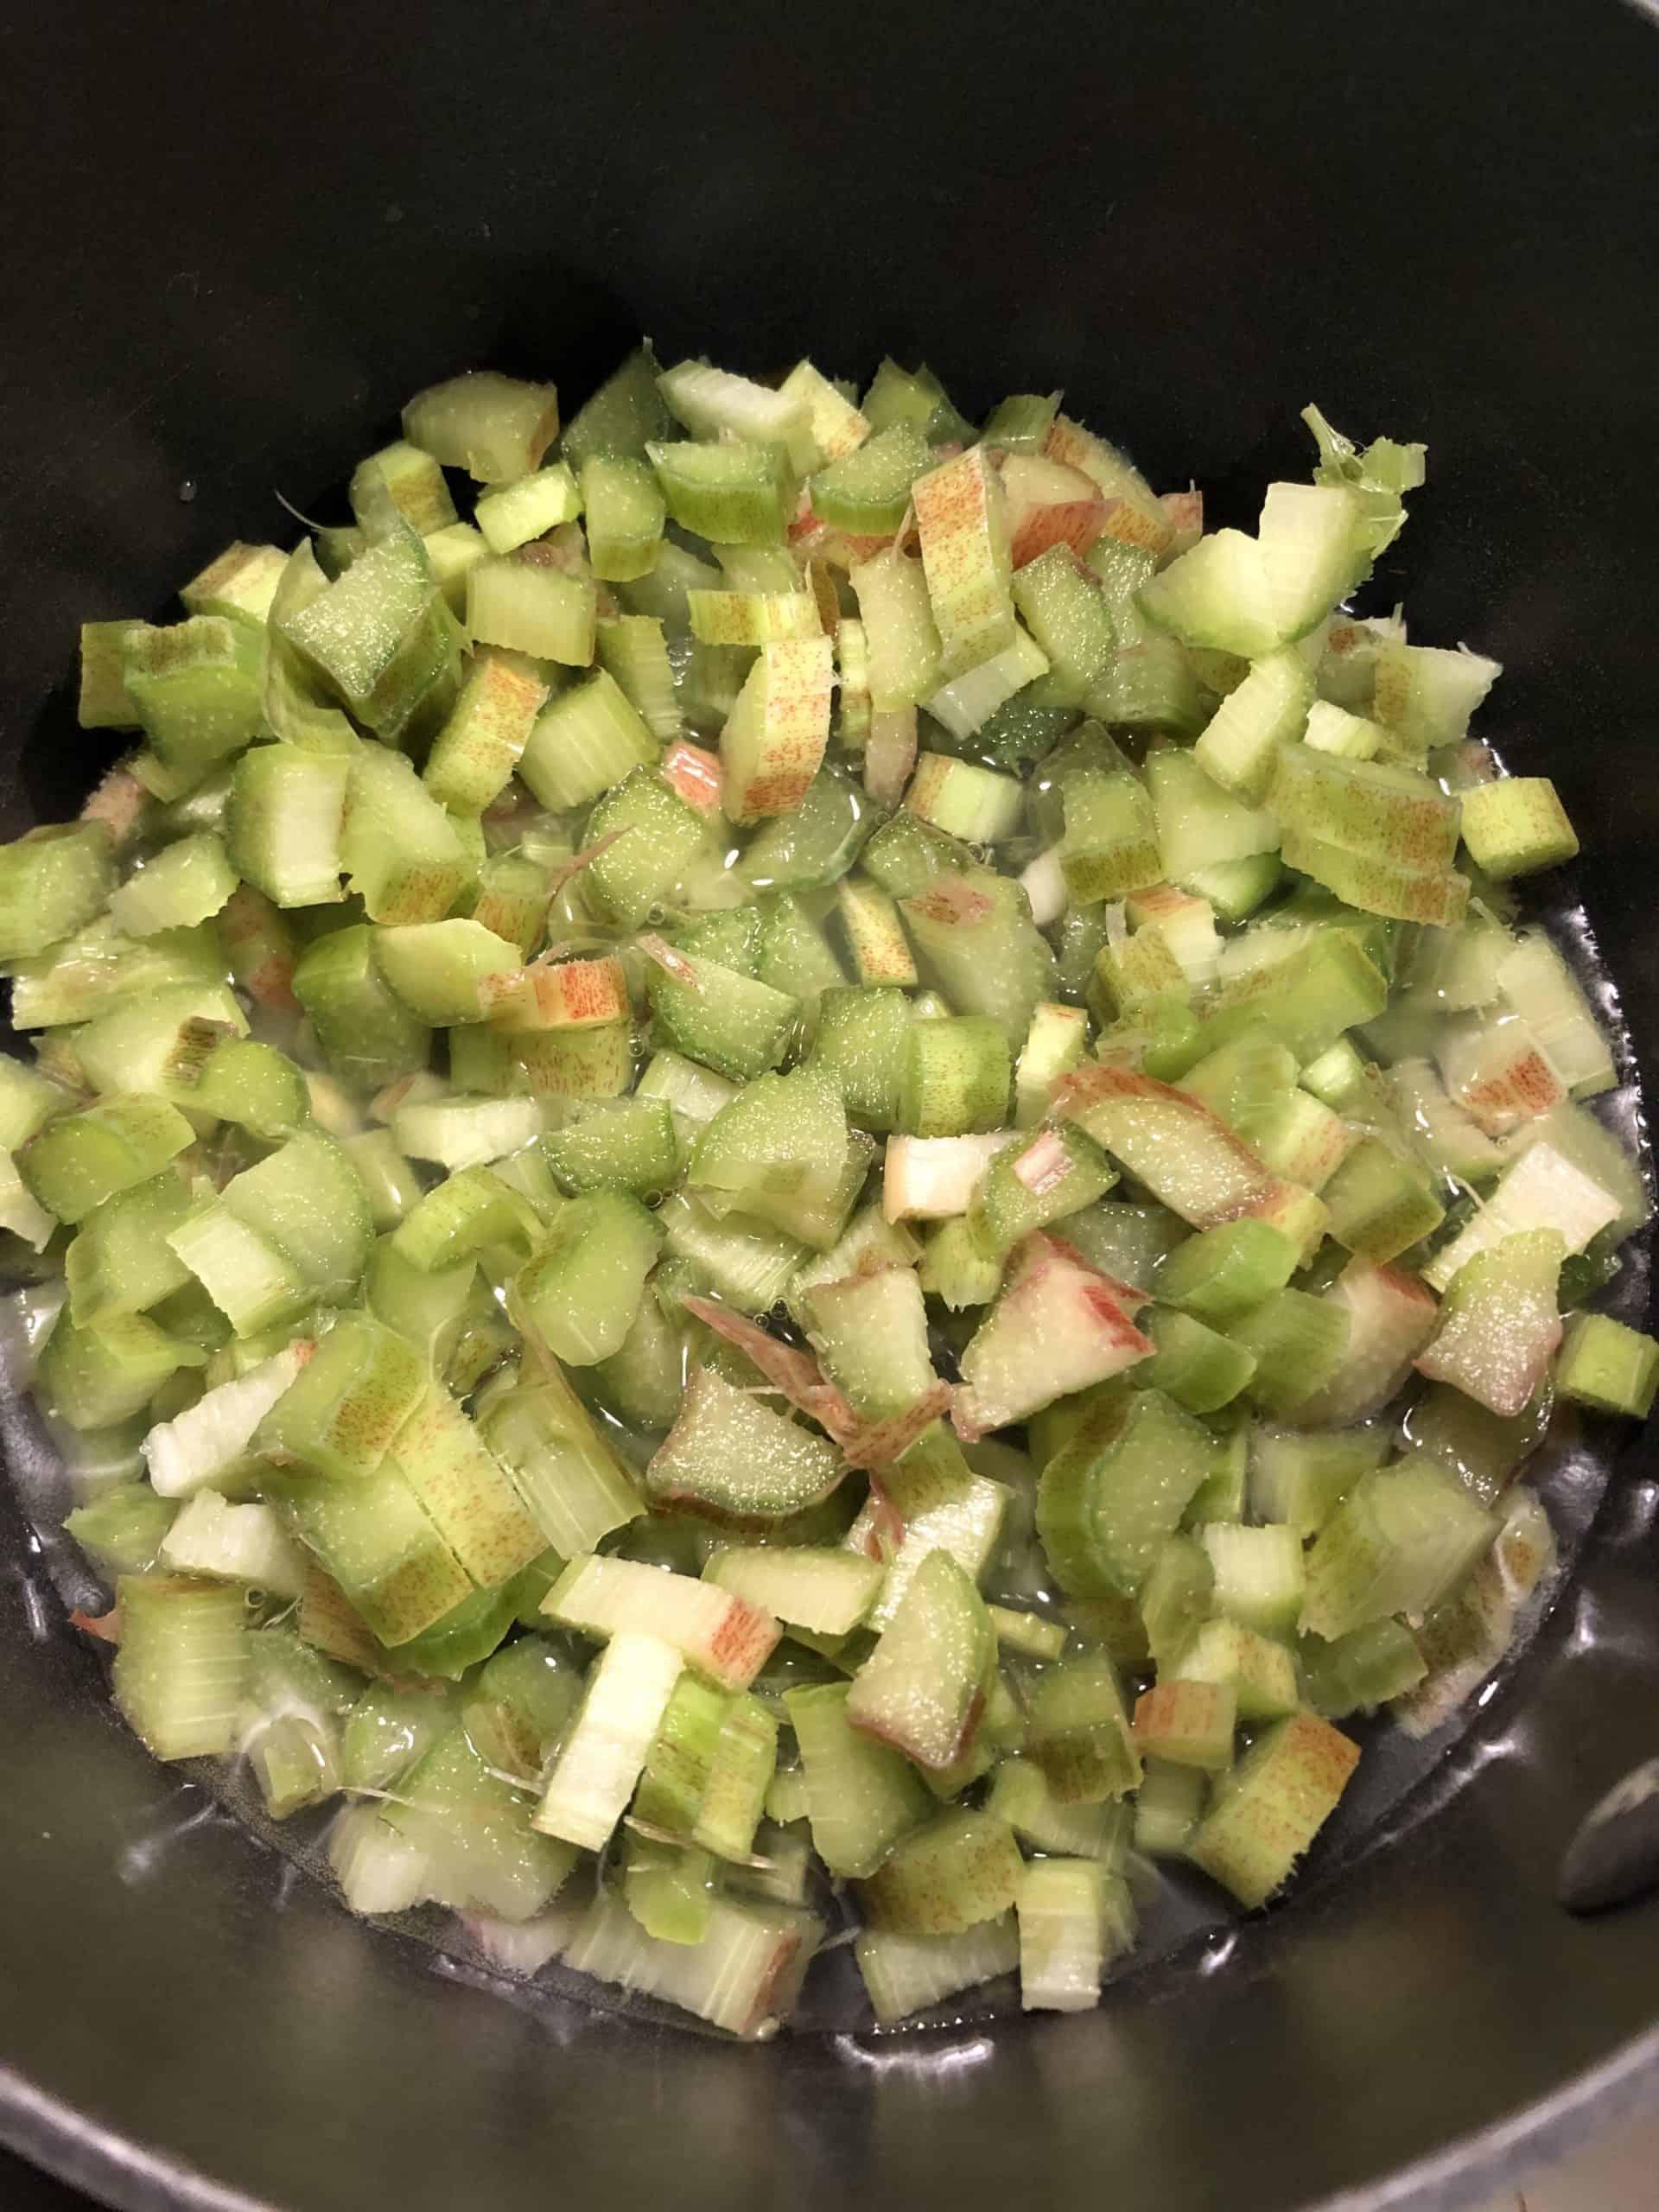 Diced Rhubarb, Lemon Juice and Water in Stock Pot